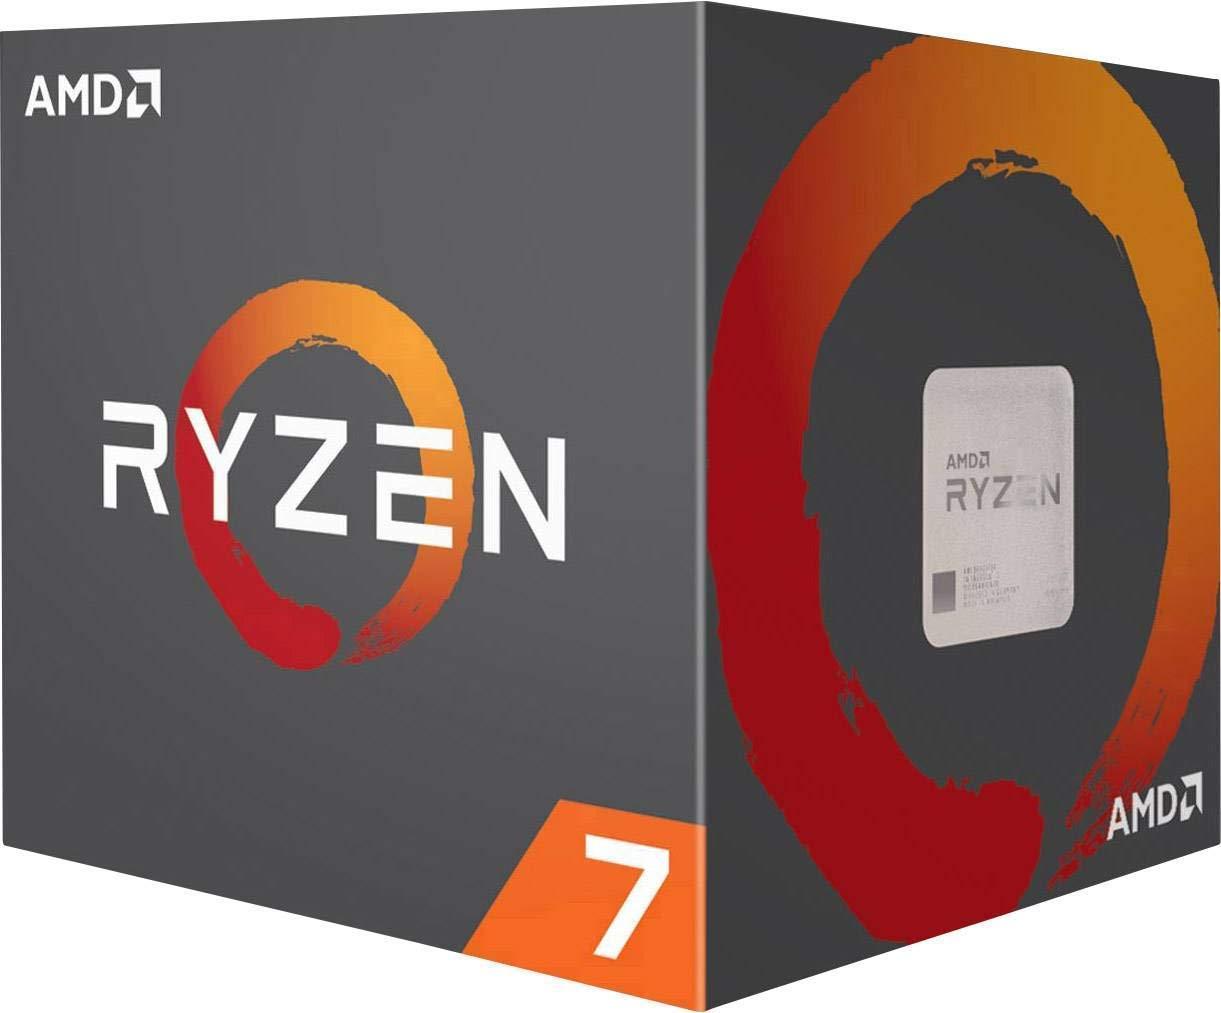 AMD Ryzen 7 3800X Processor (8C/16T, 36MB Cache, 4.5 GHz Max Boost) £314.99 @ Amazon